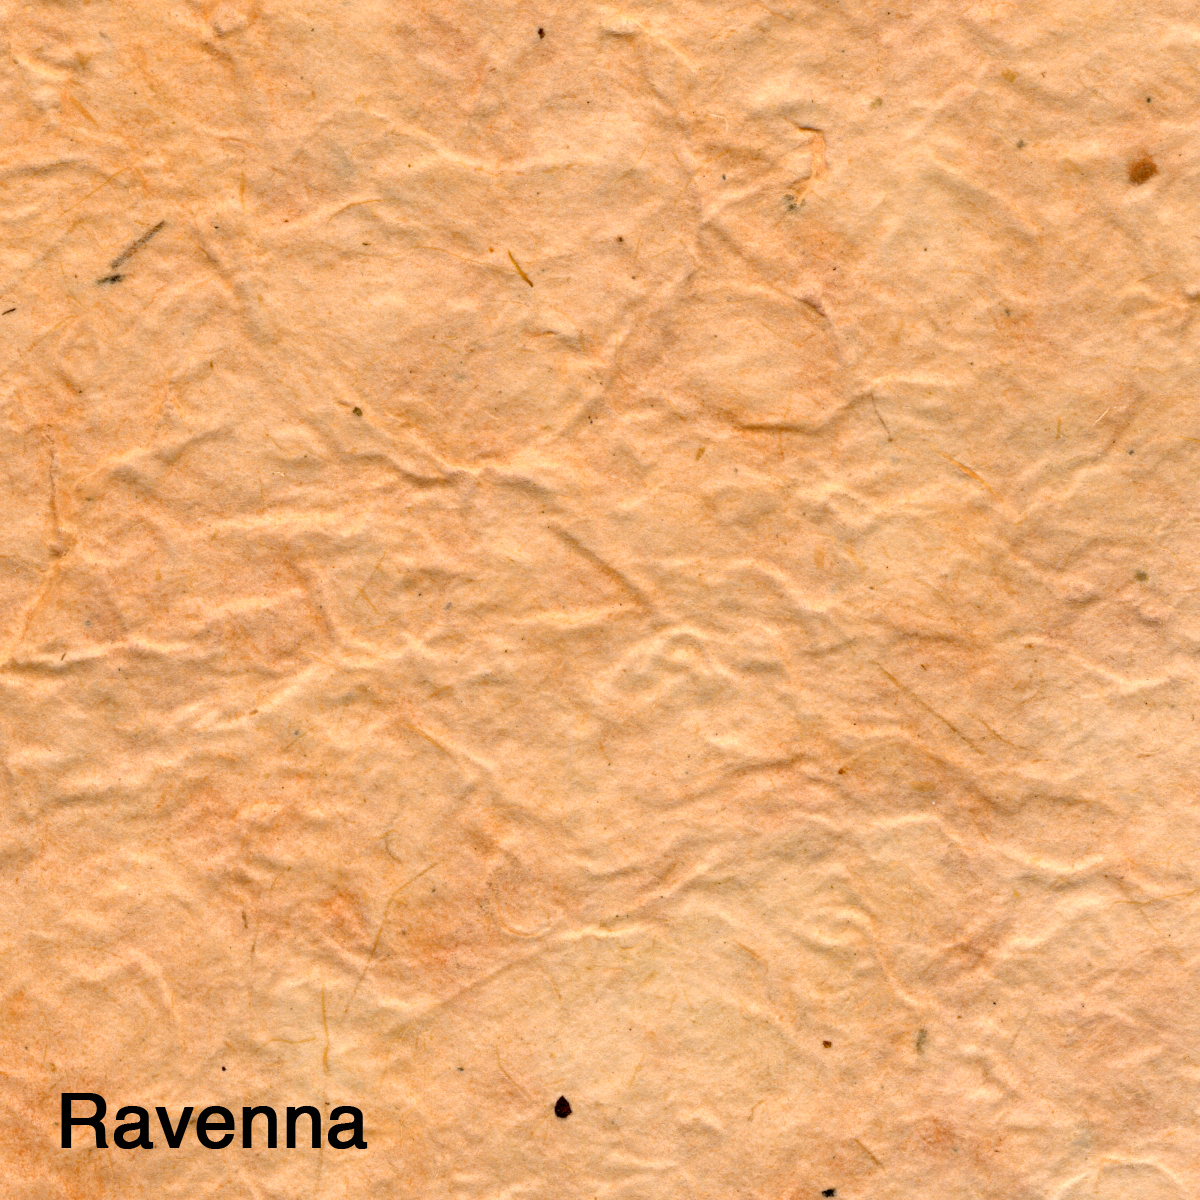 Ravenna.jpg